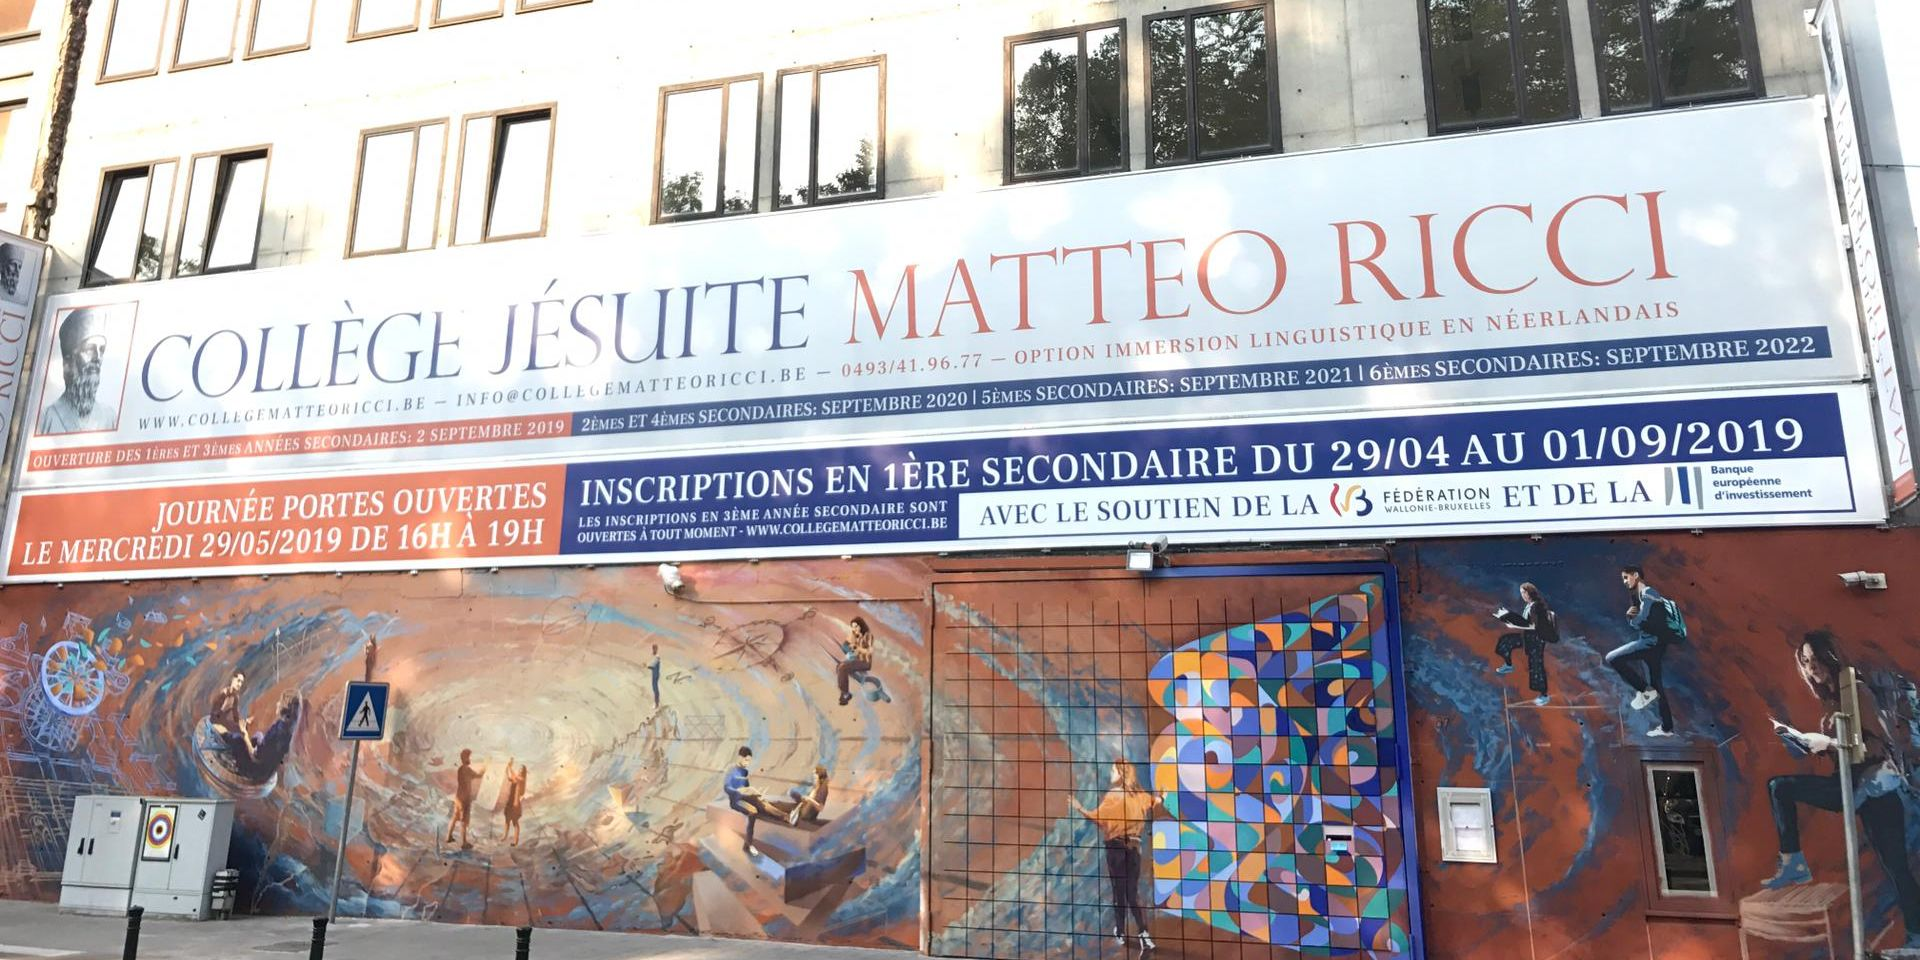 Collège Matteo Ricci Bruxelles